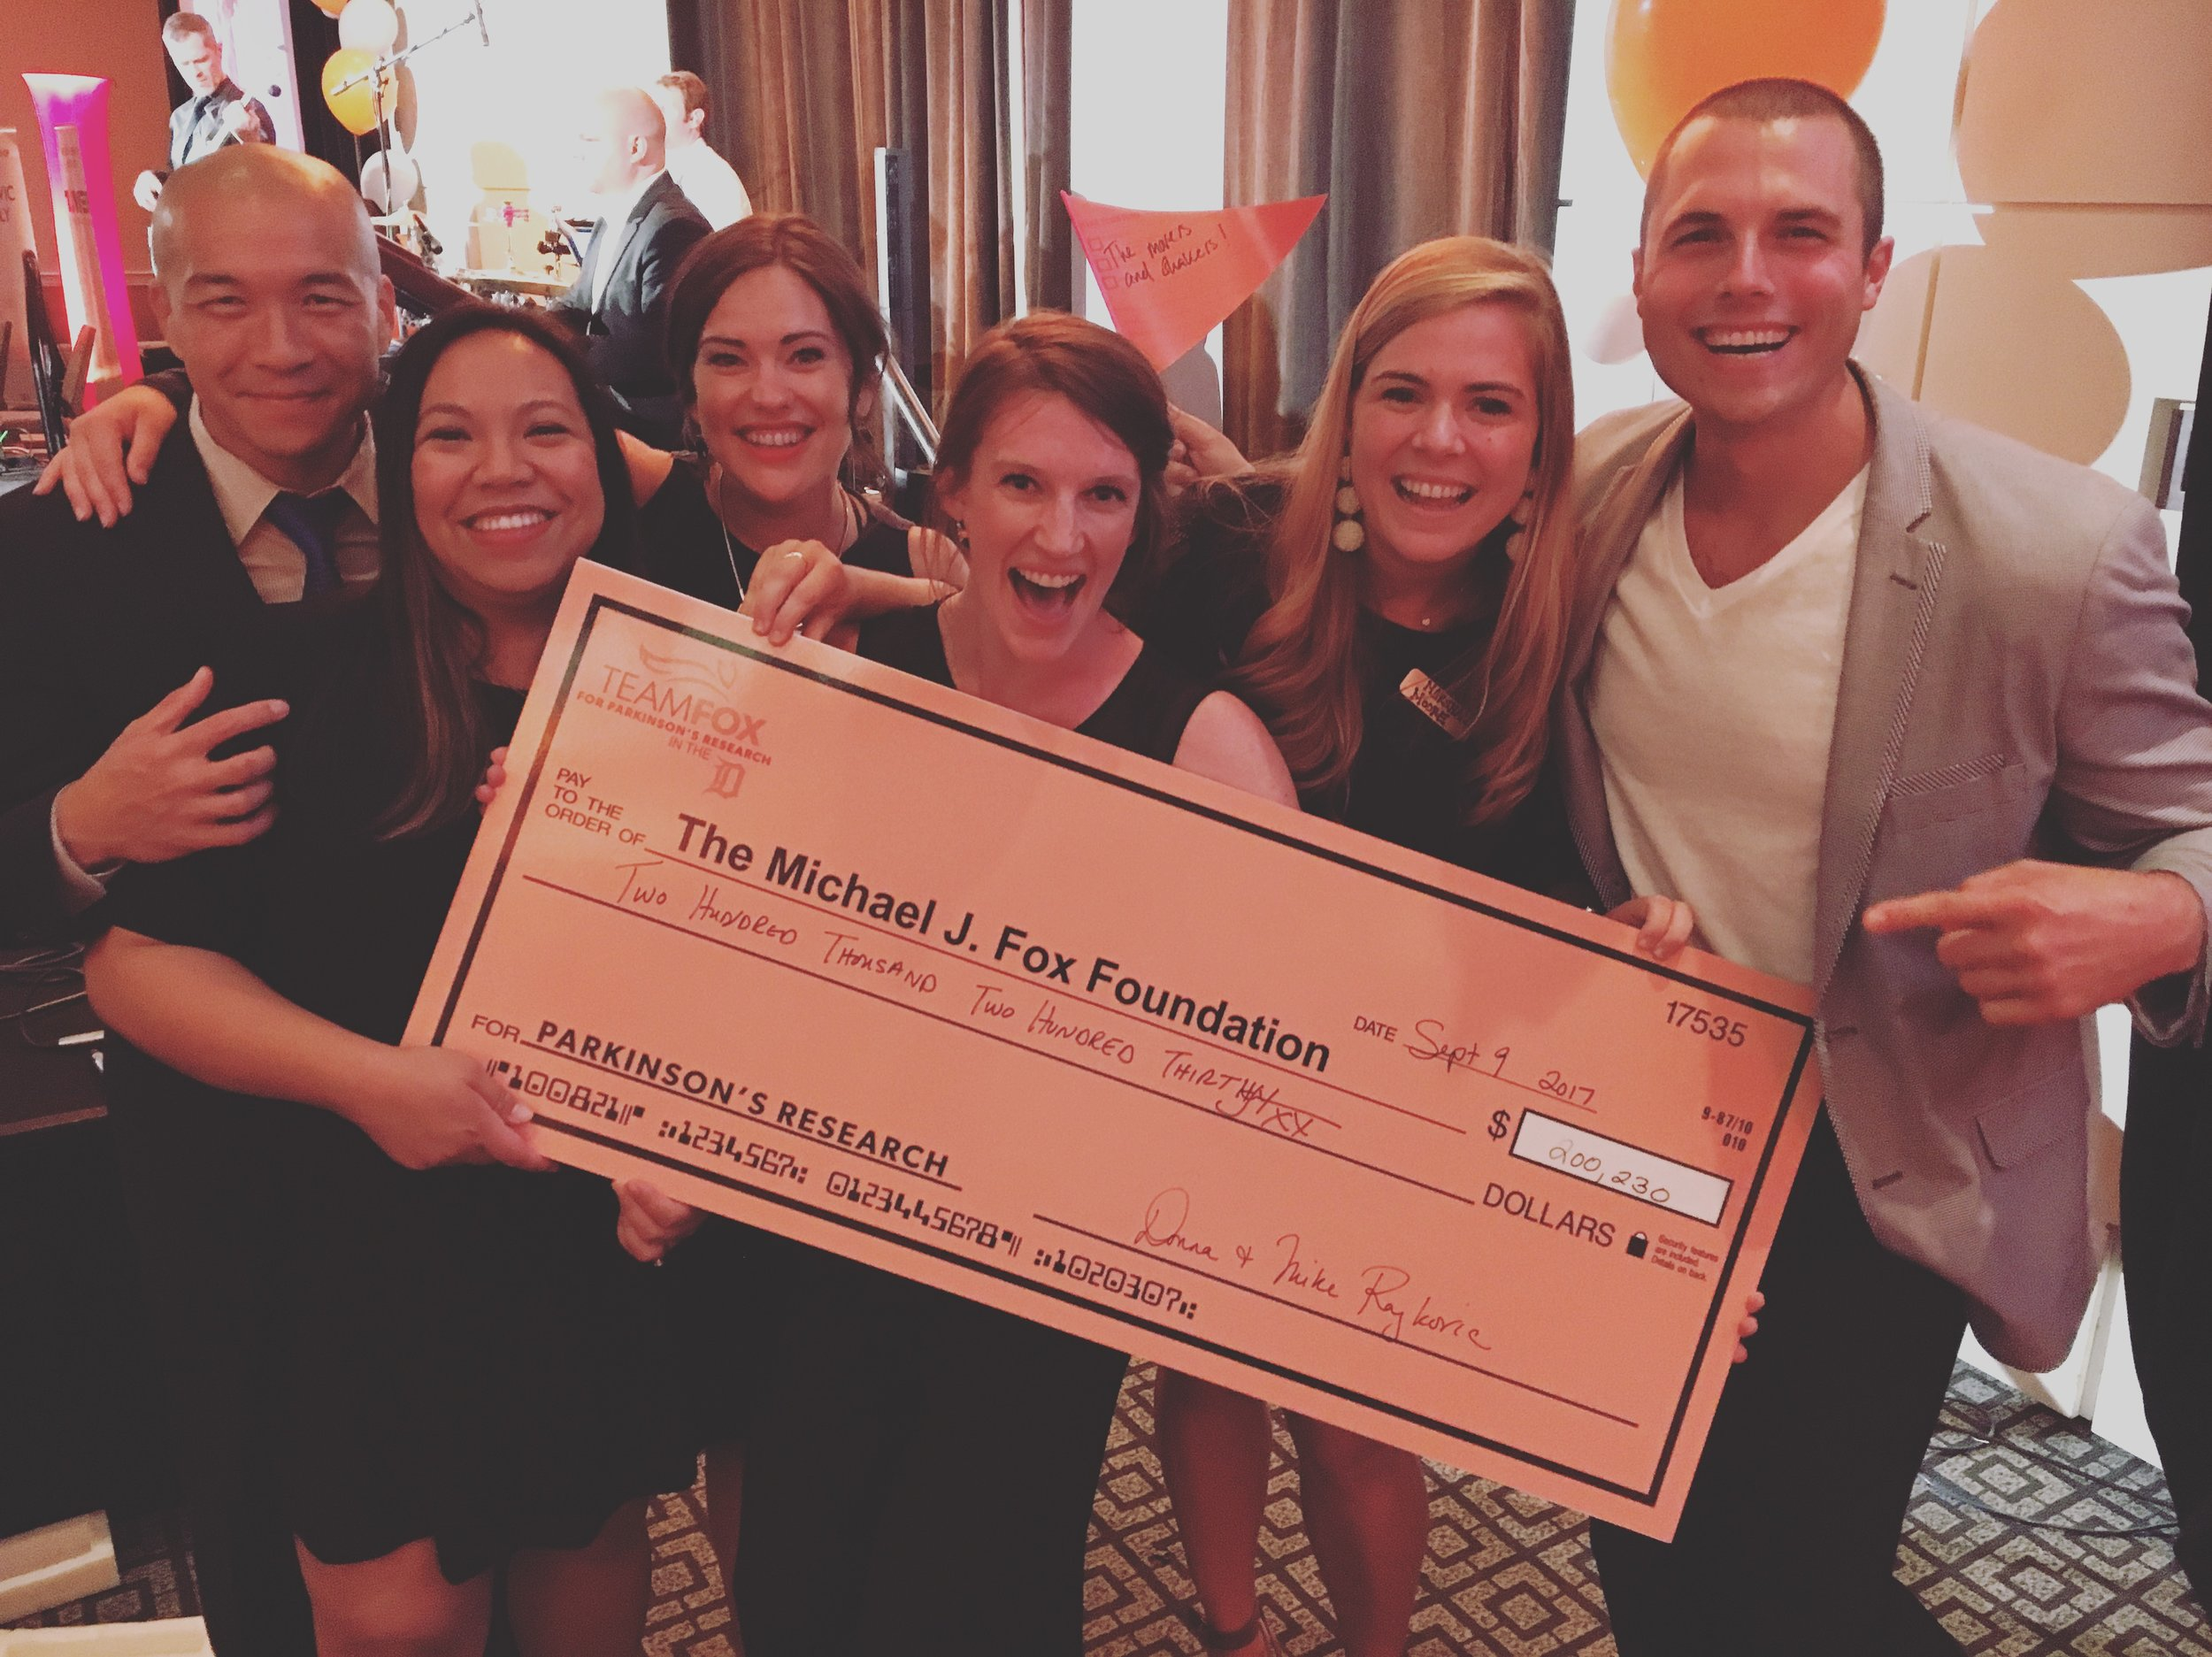 Michael J. Fox Foundation Fundraiser